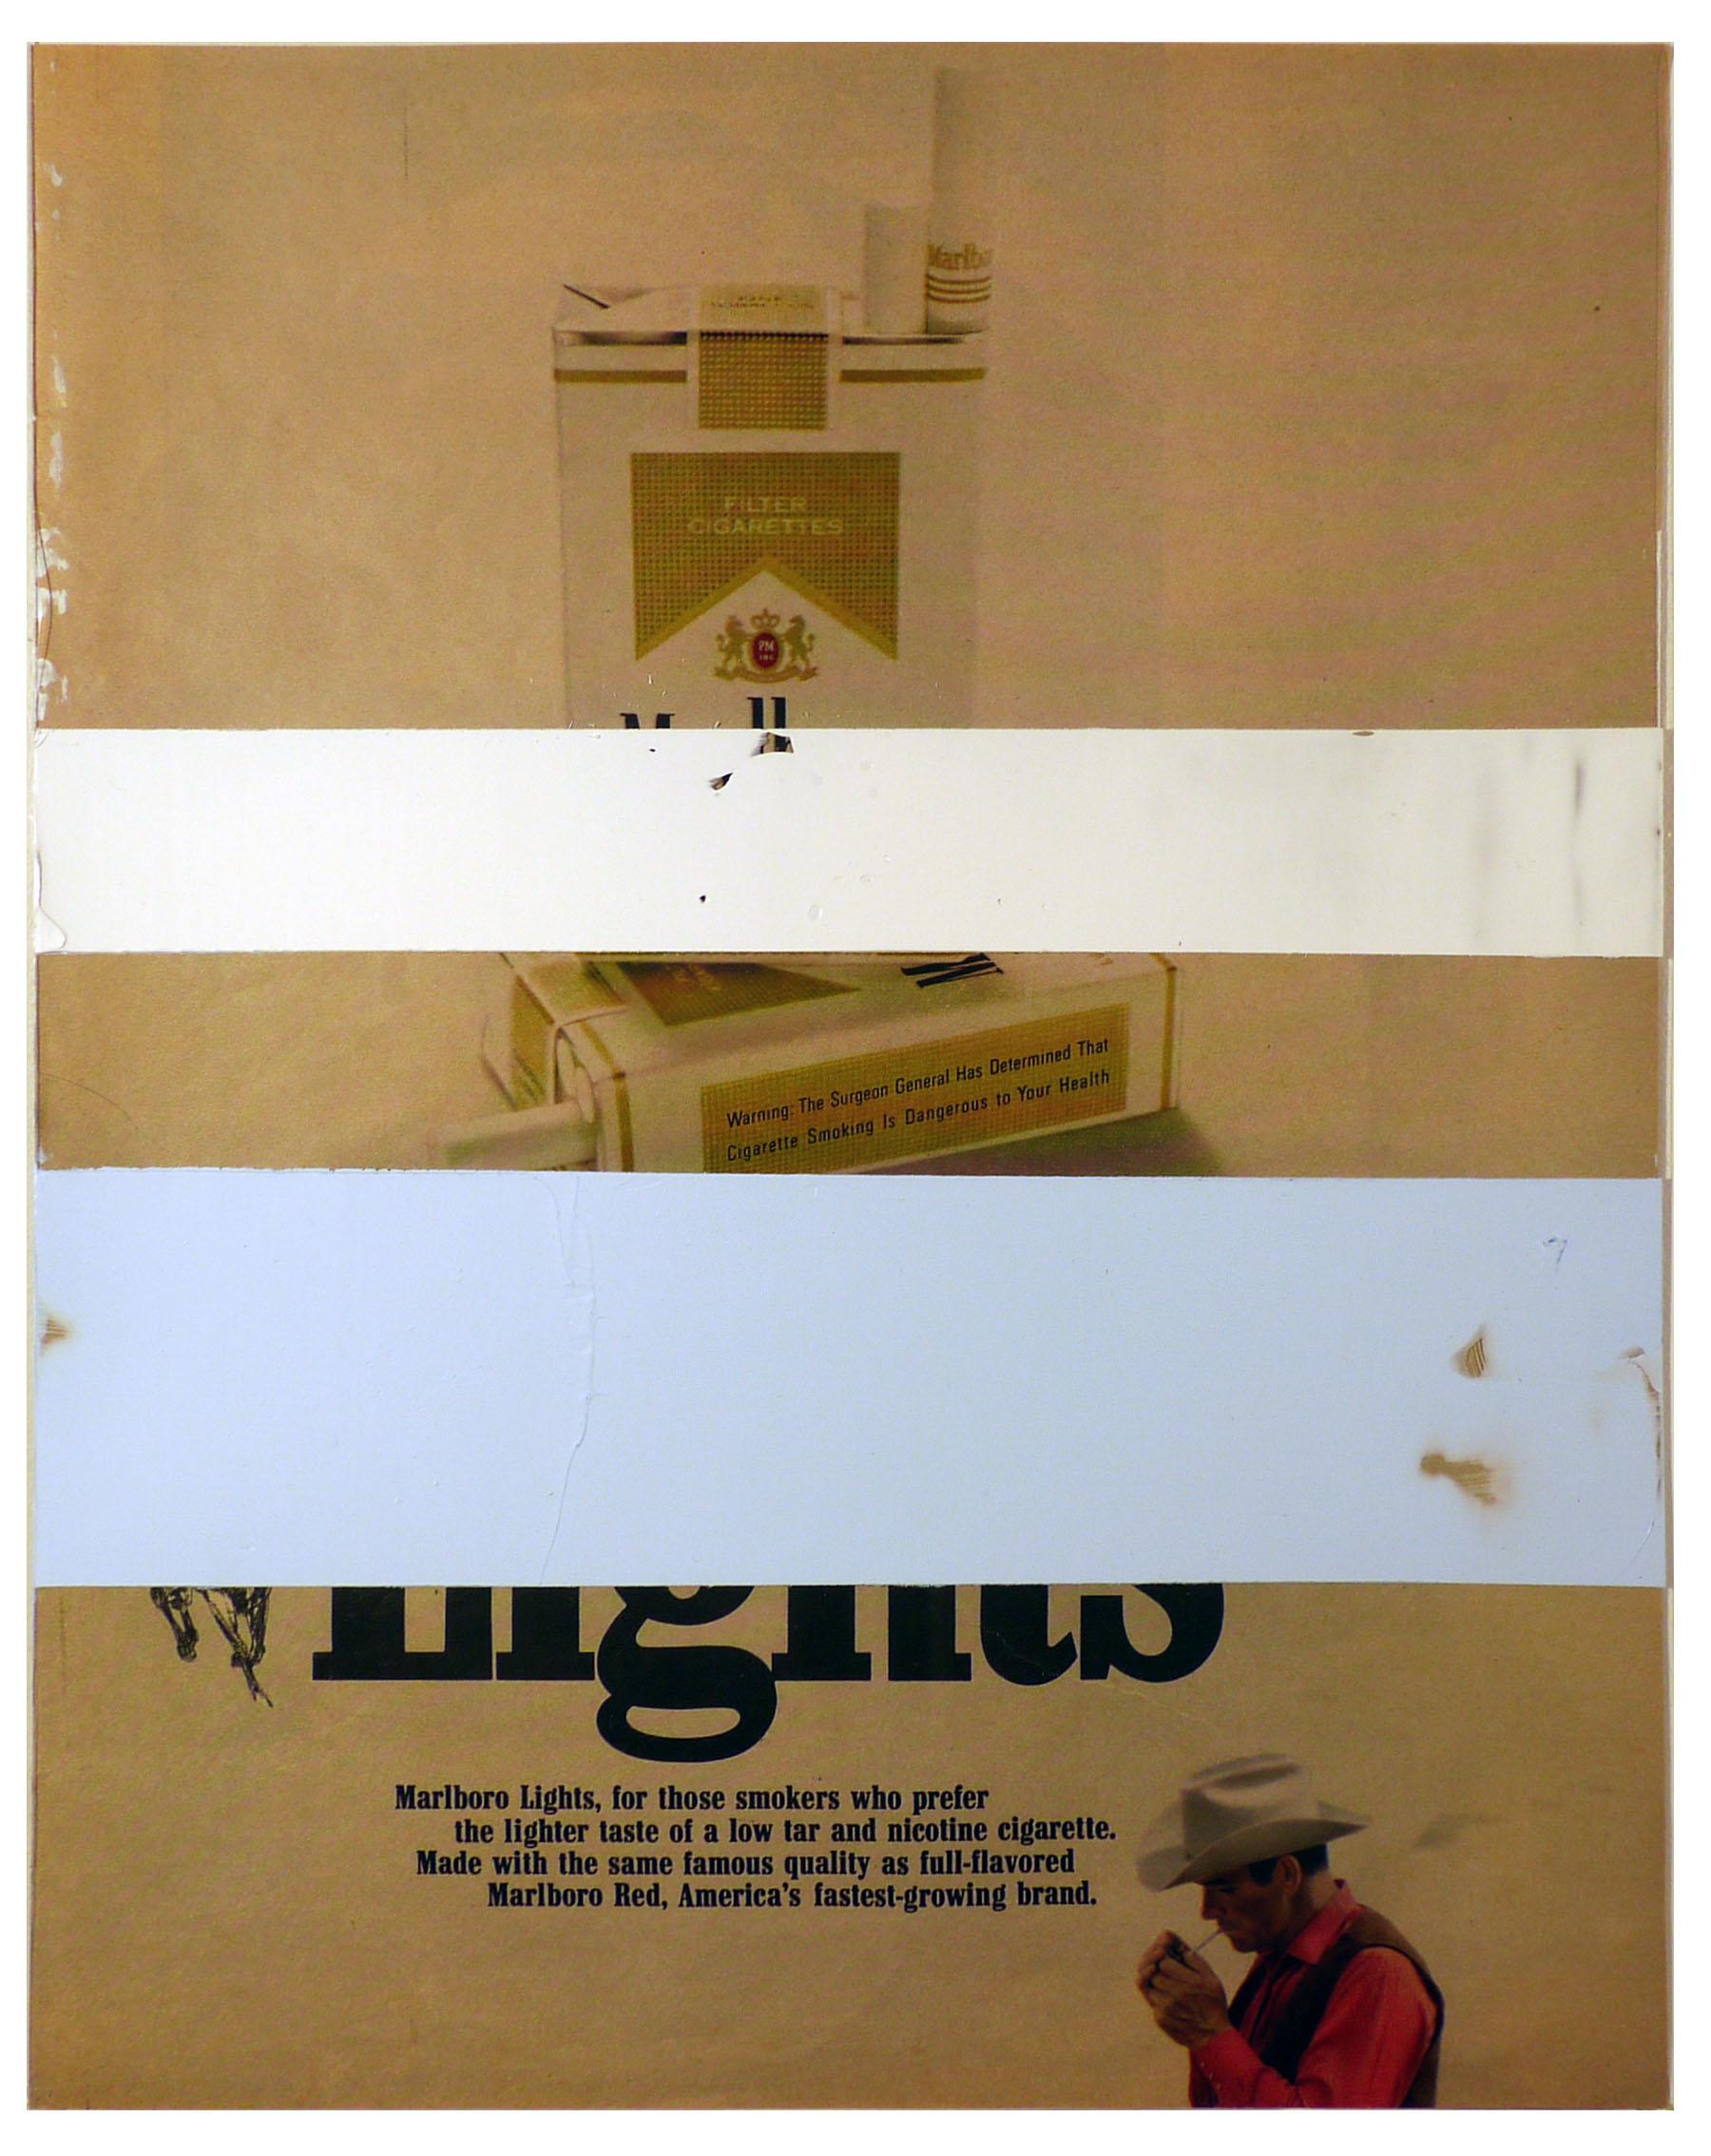 cowboy  10.25 x 13 inches  acylic duralar paper